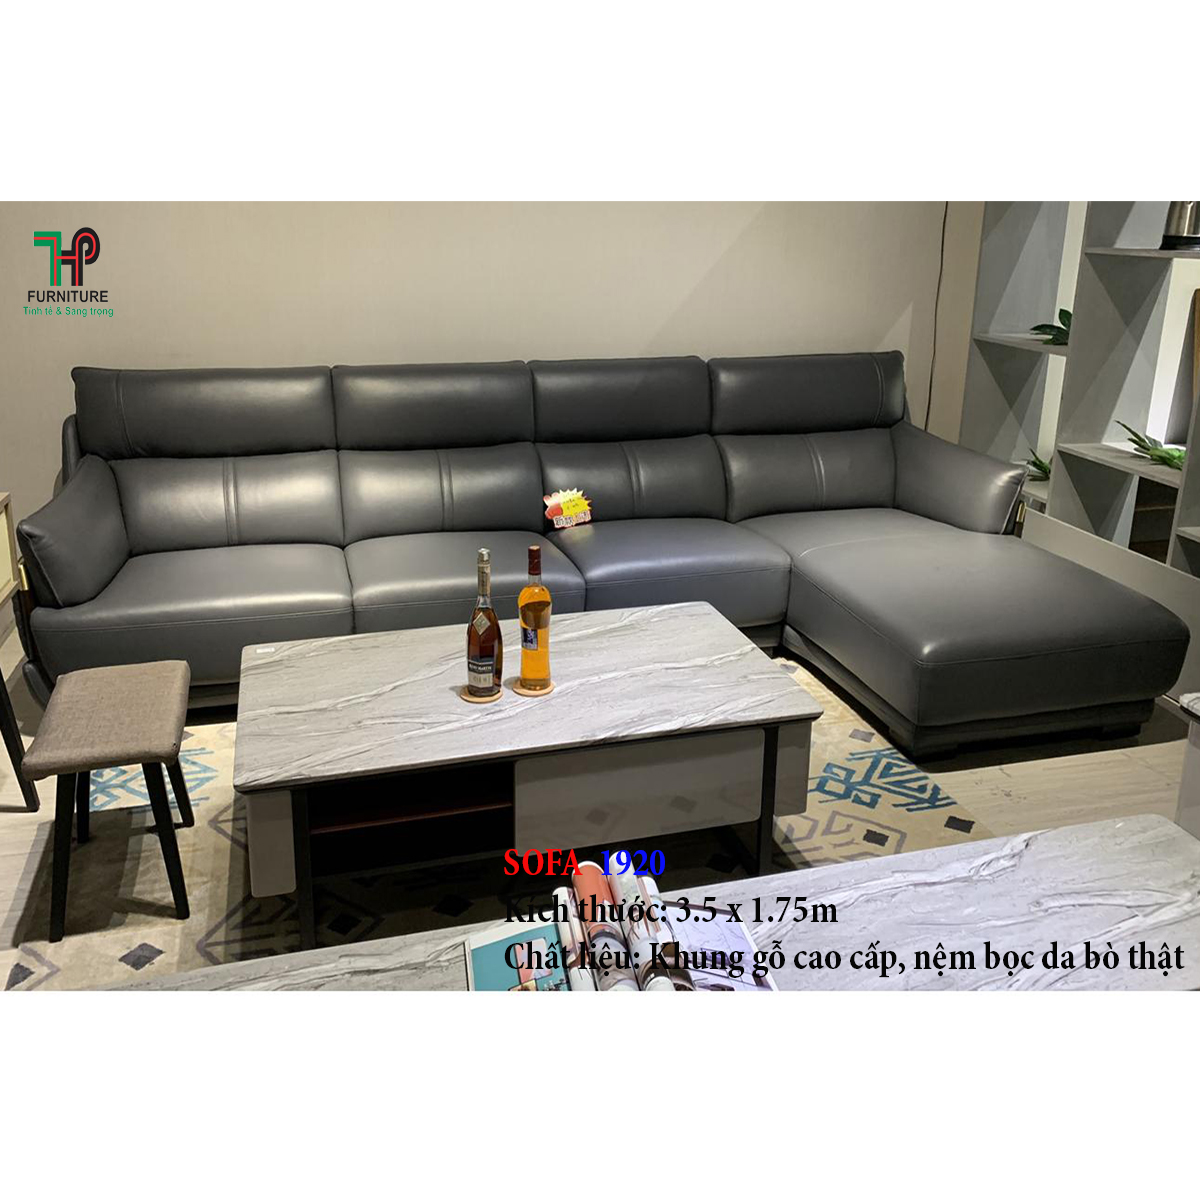 sofa-da-cao-cap-nhap-khau-2.jpg